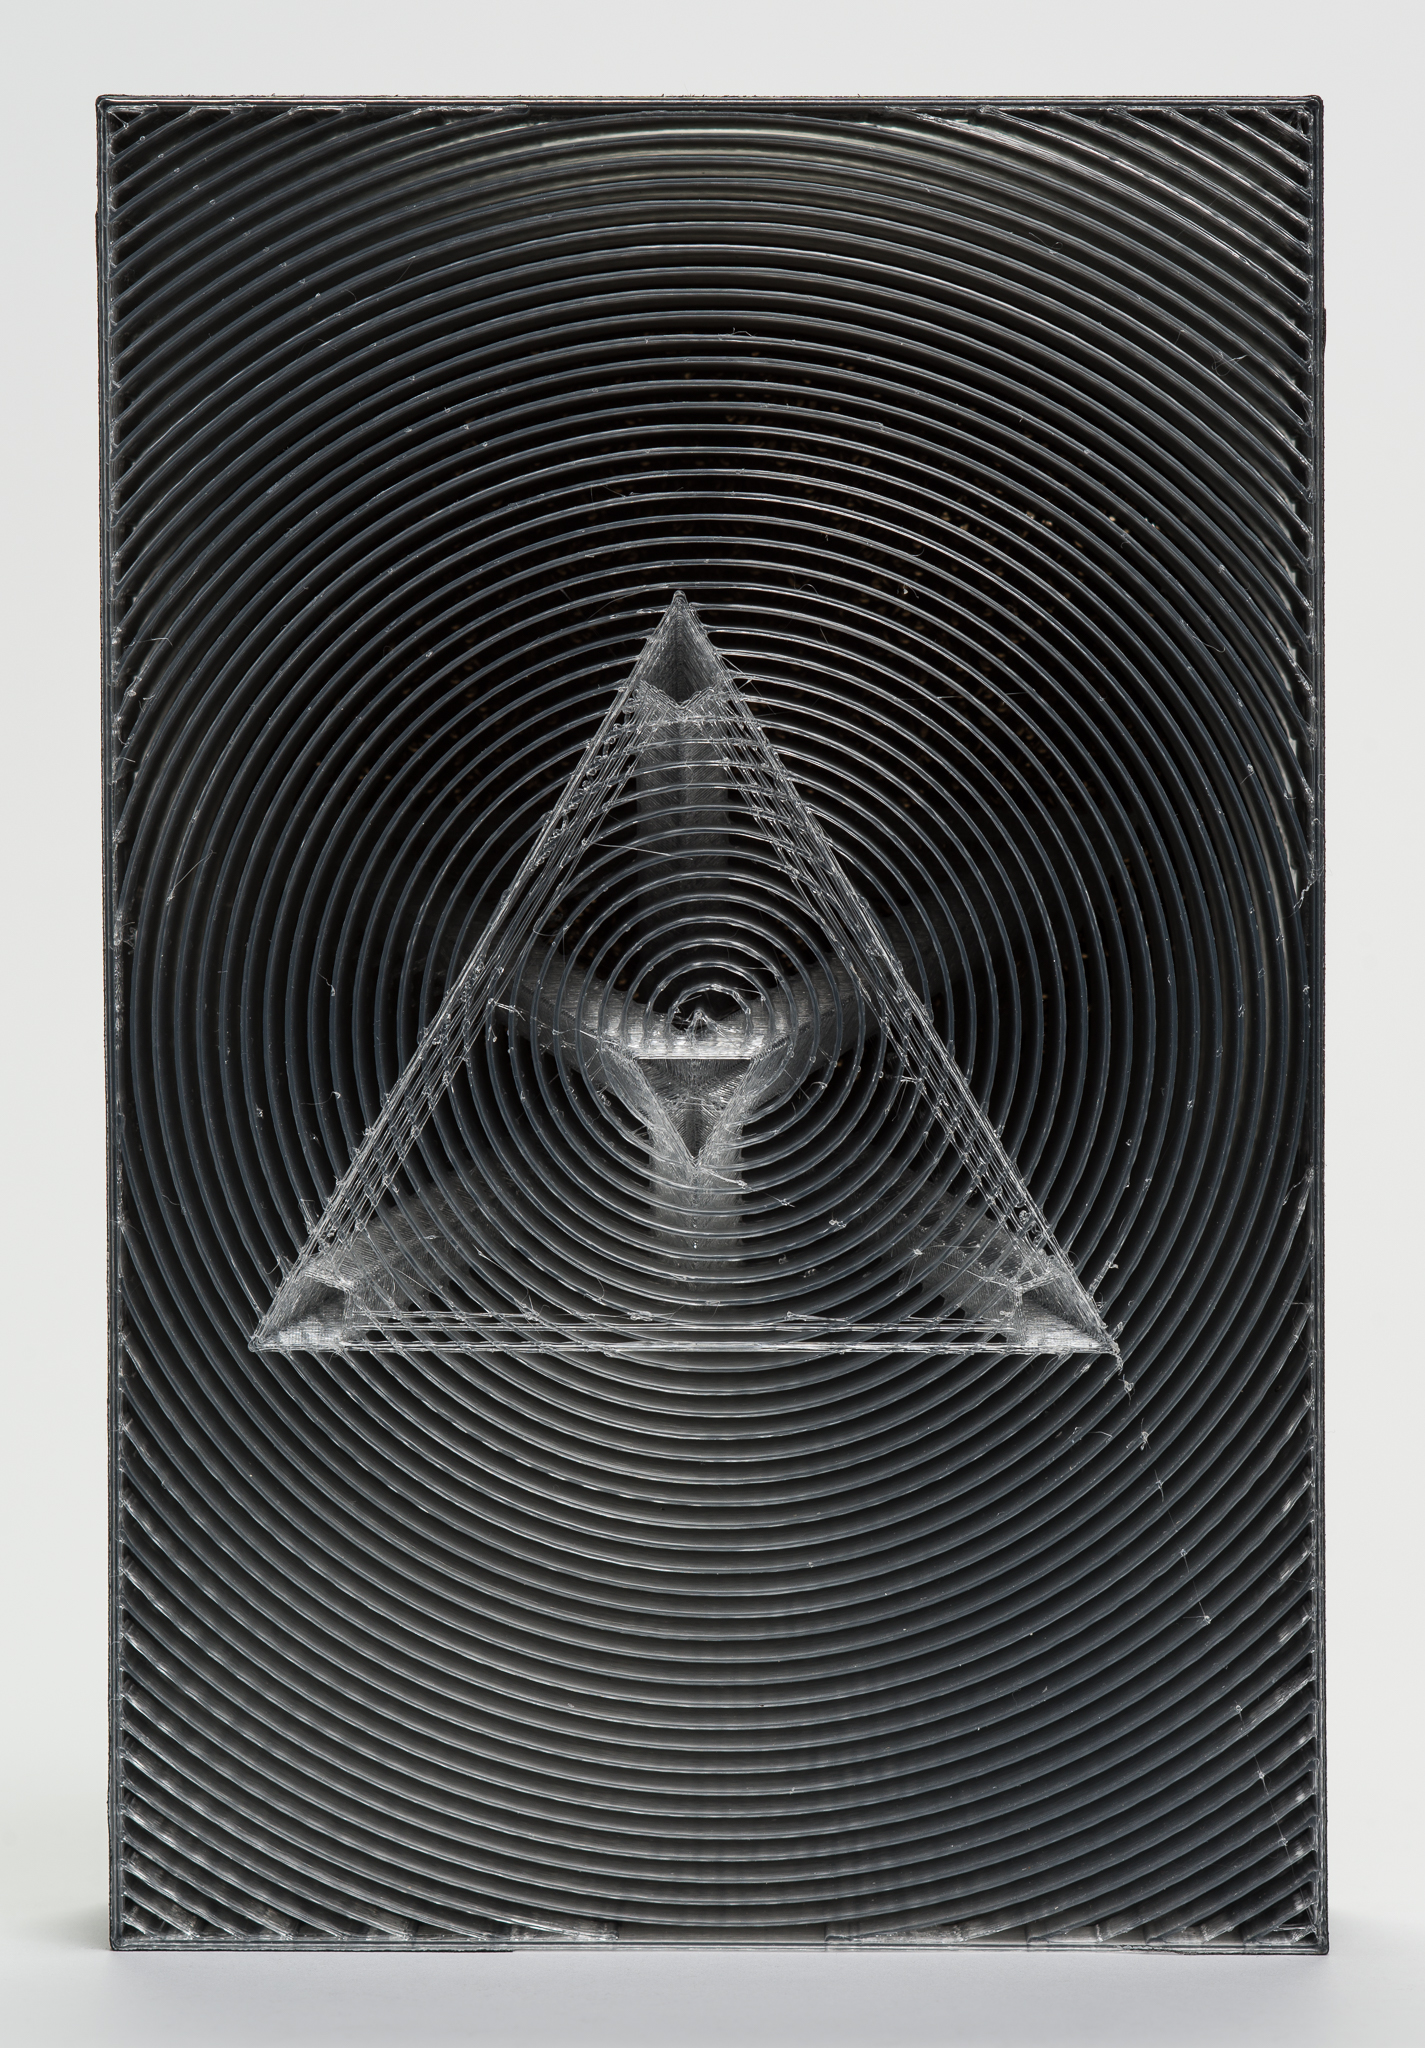 Structure No.05_PLA-3D printed_6x9x2.25_01.jpg